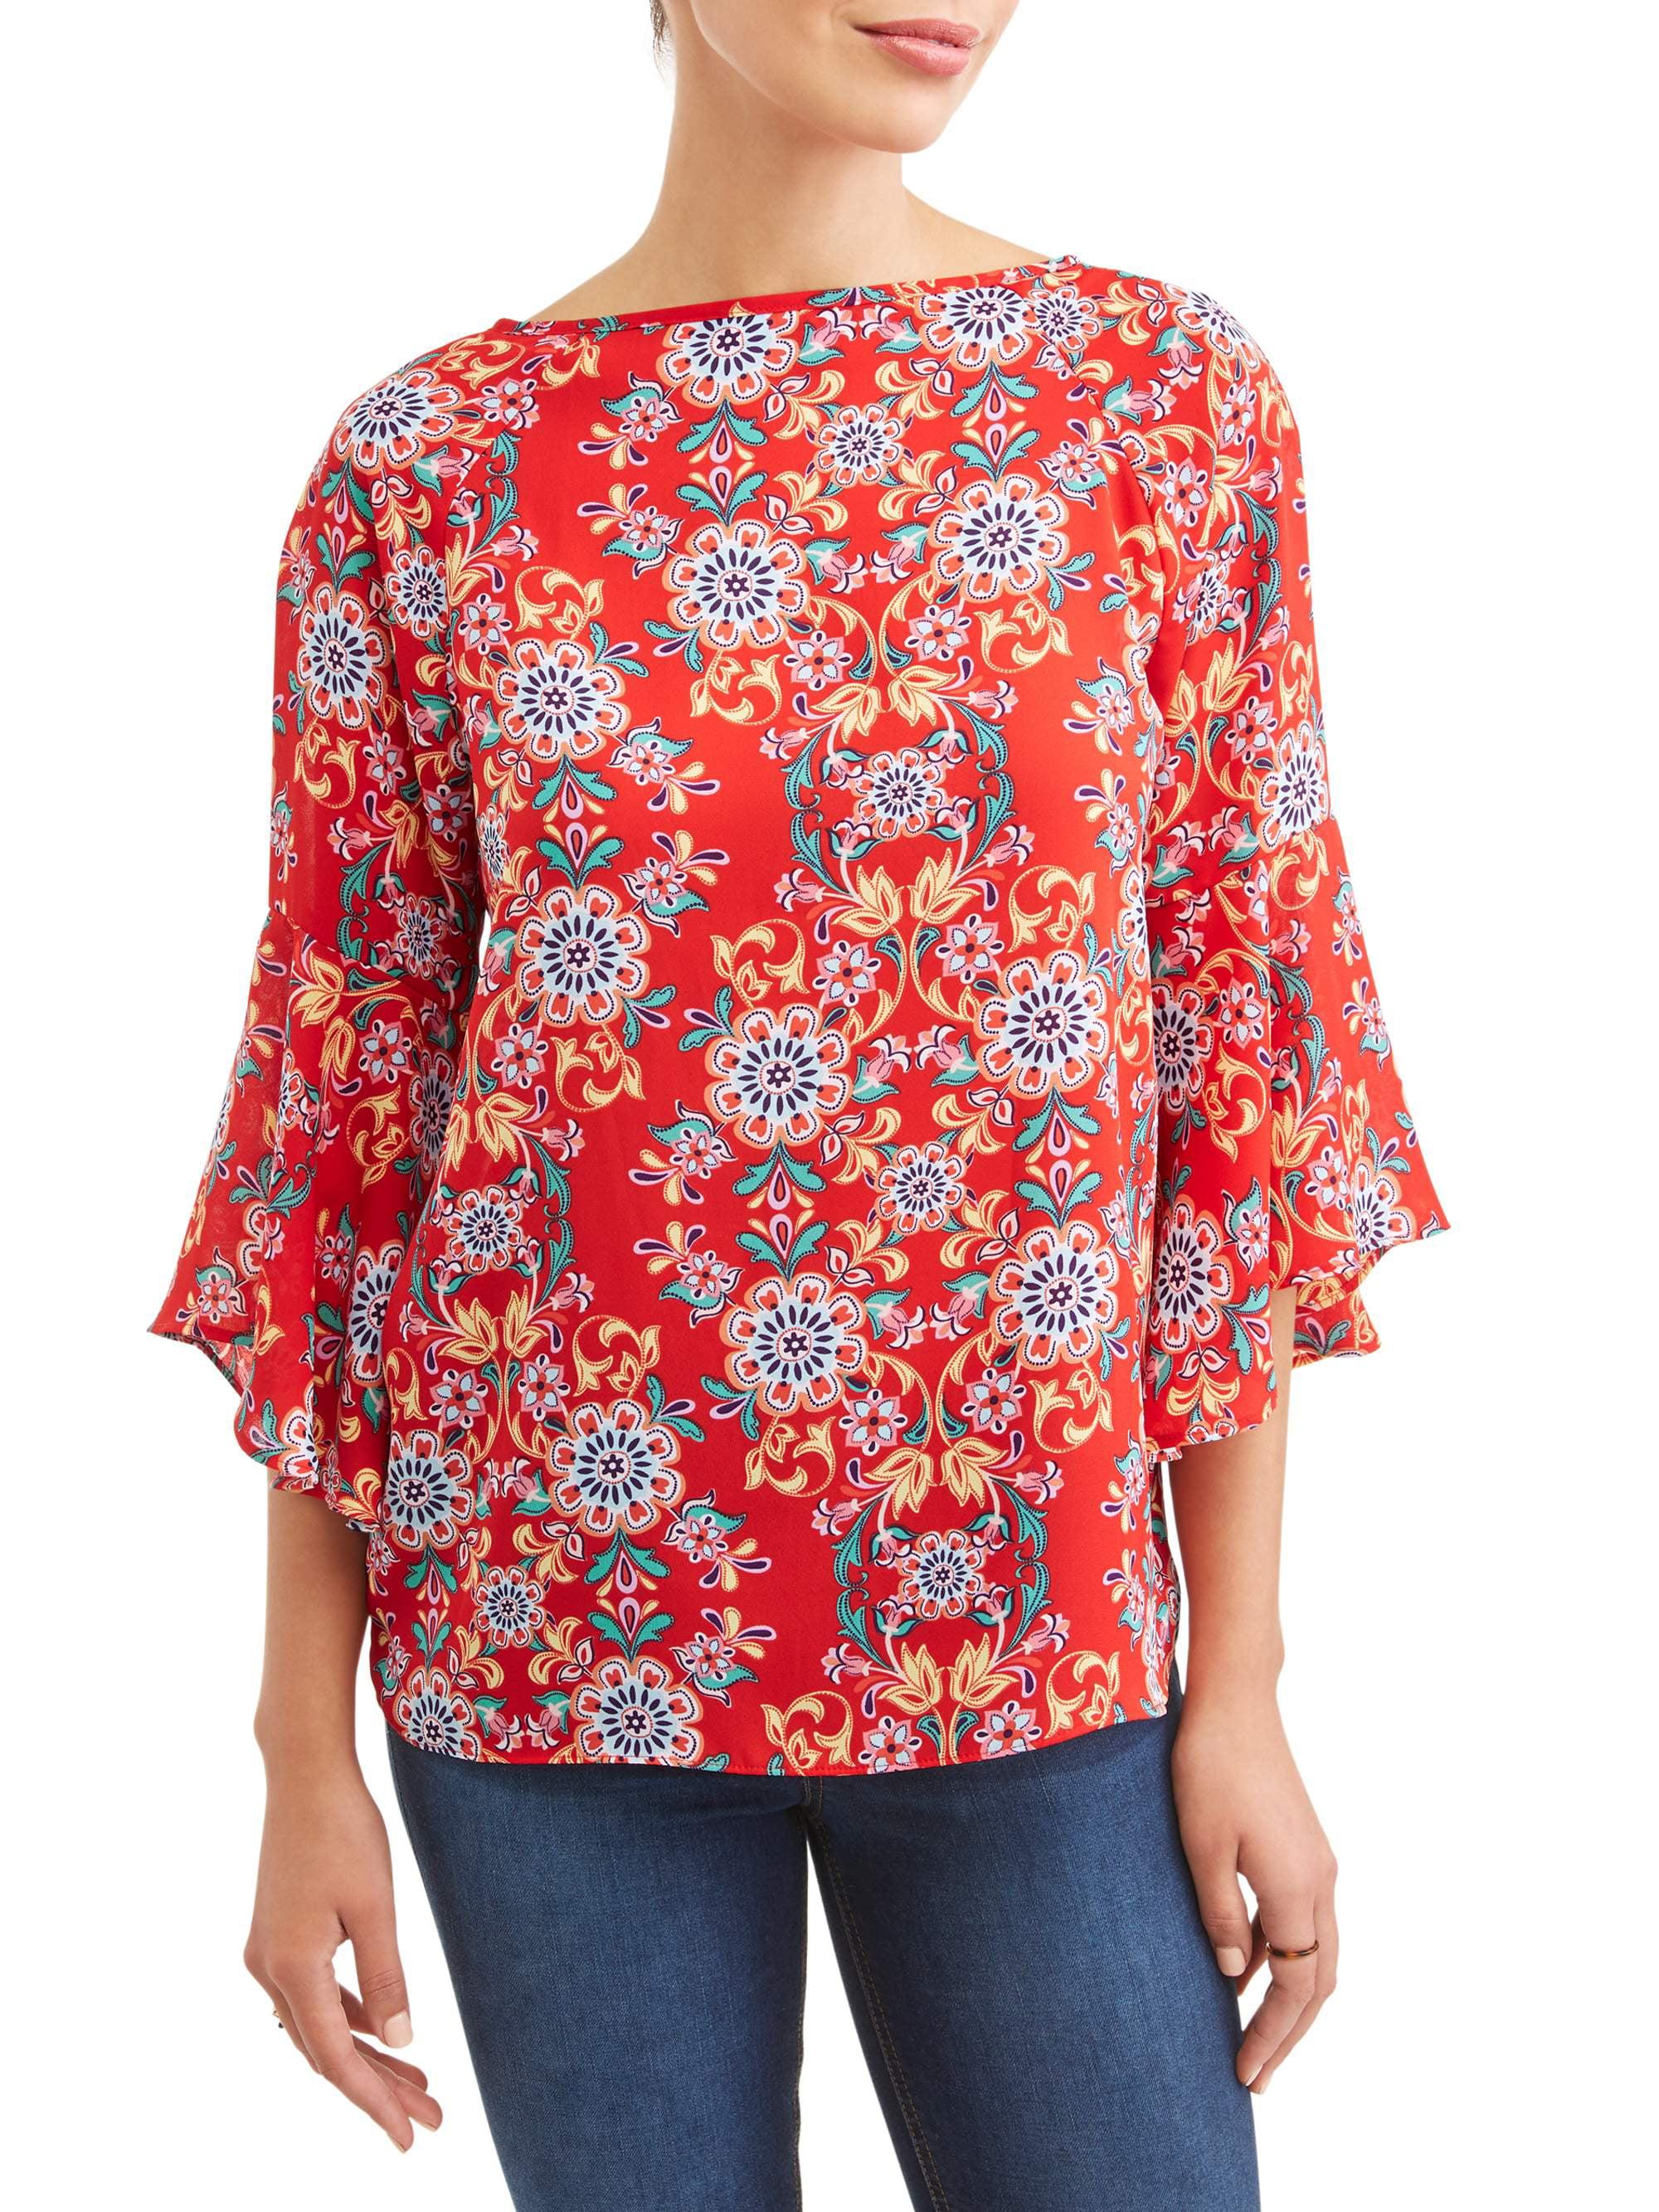 Women's Printed Ruffle Sleeve Top